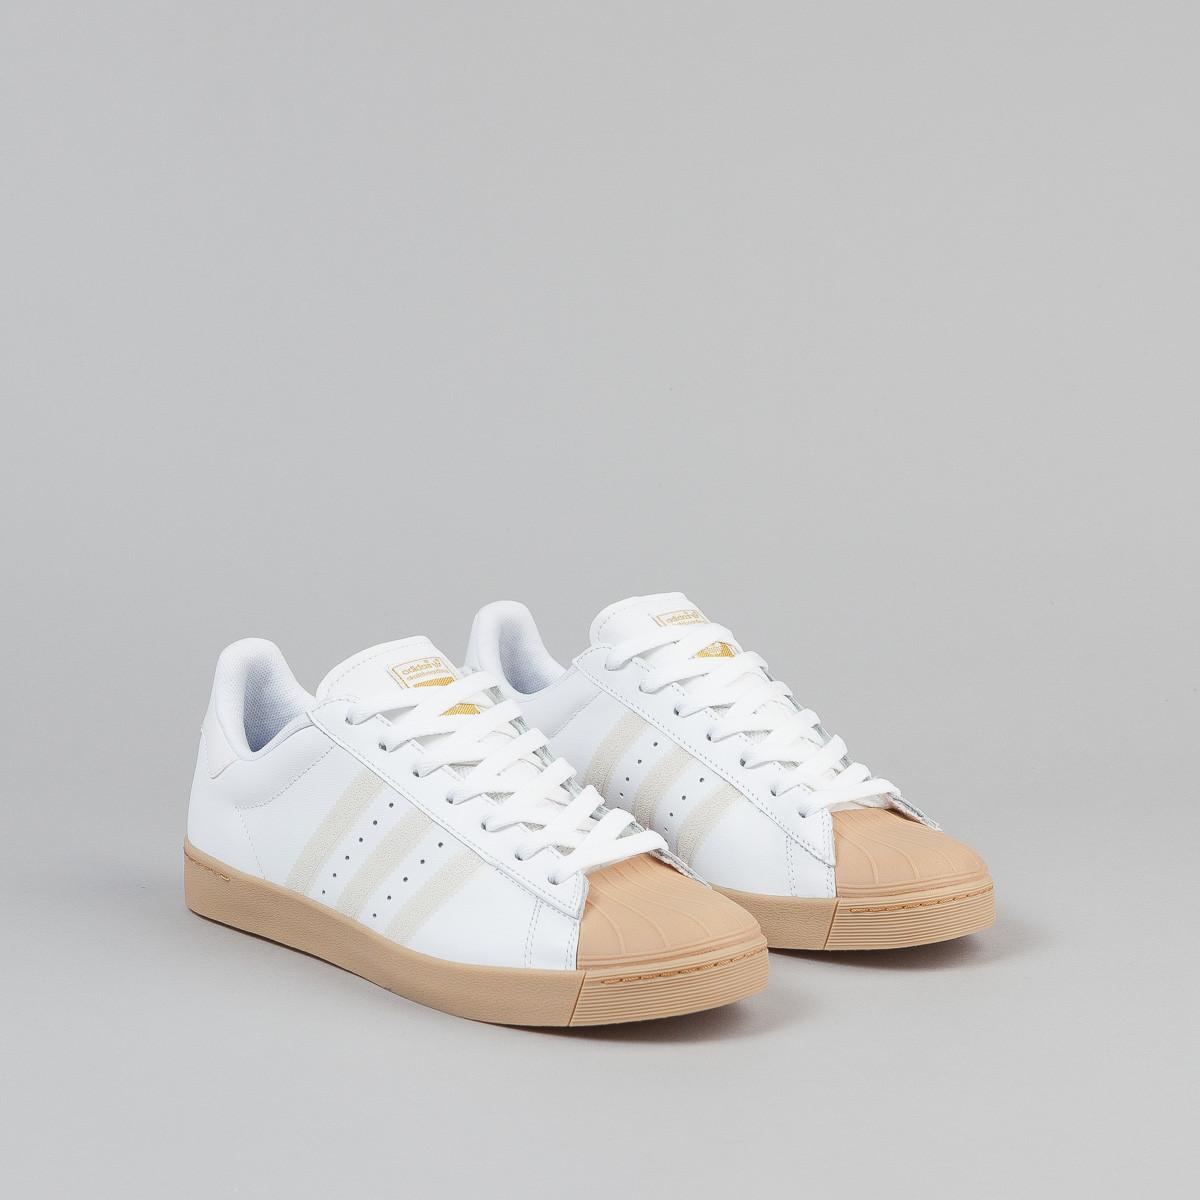 La nouvelle Adidas Superstar Vulc ADV